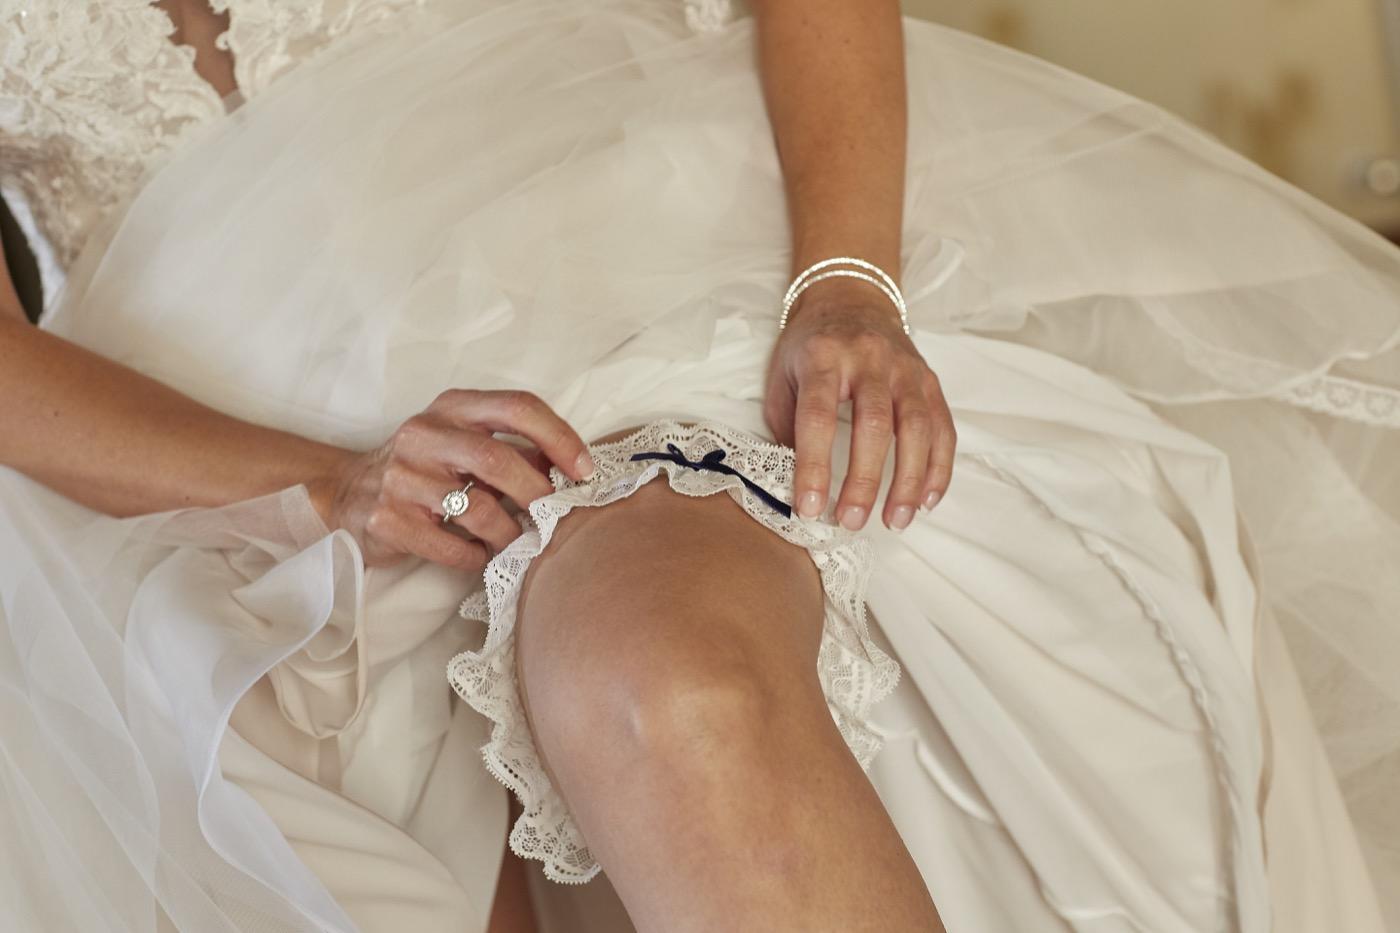 Claudio-Coppola-wedding-photographer-la-scuderia-eventi-preparativi-la-rosetta-perugia-21